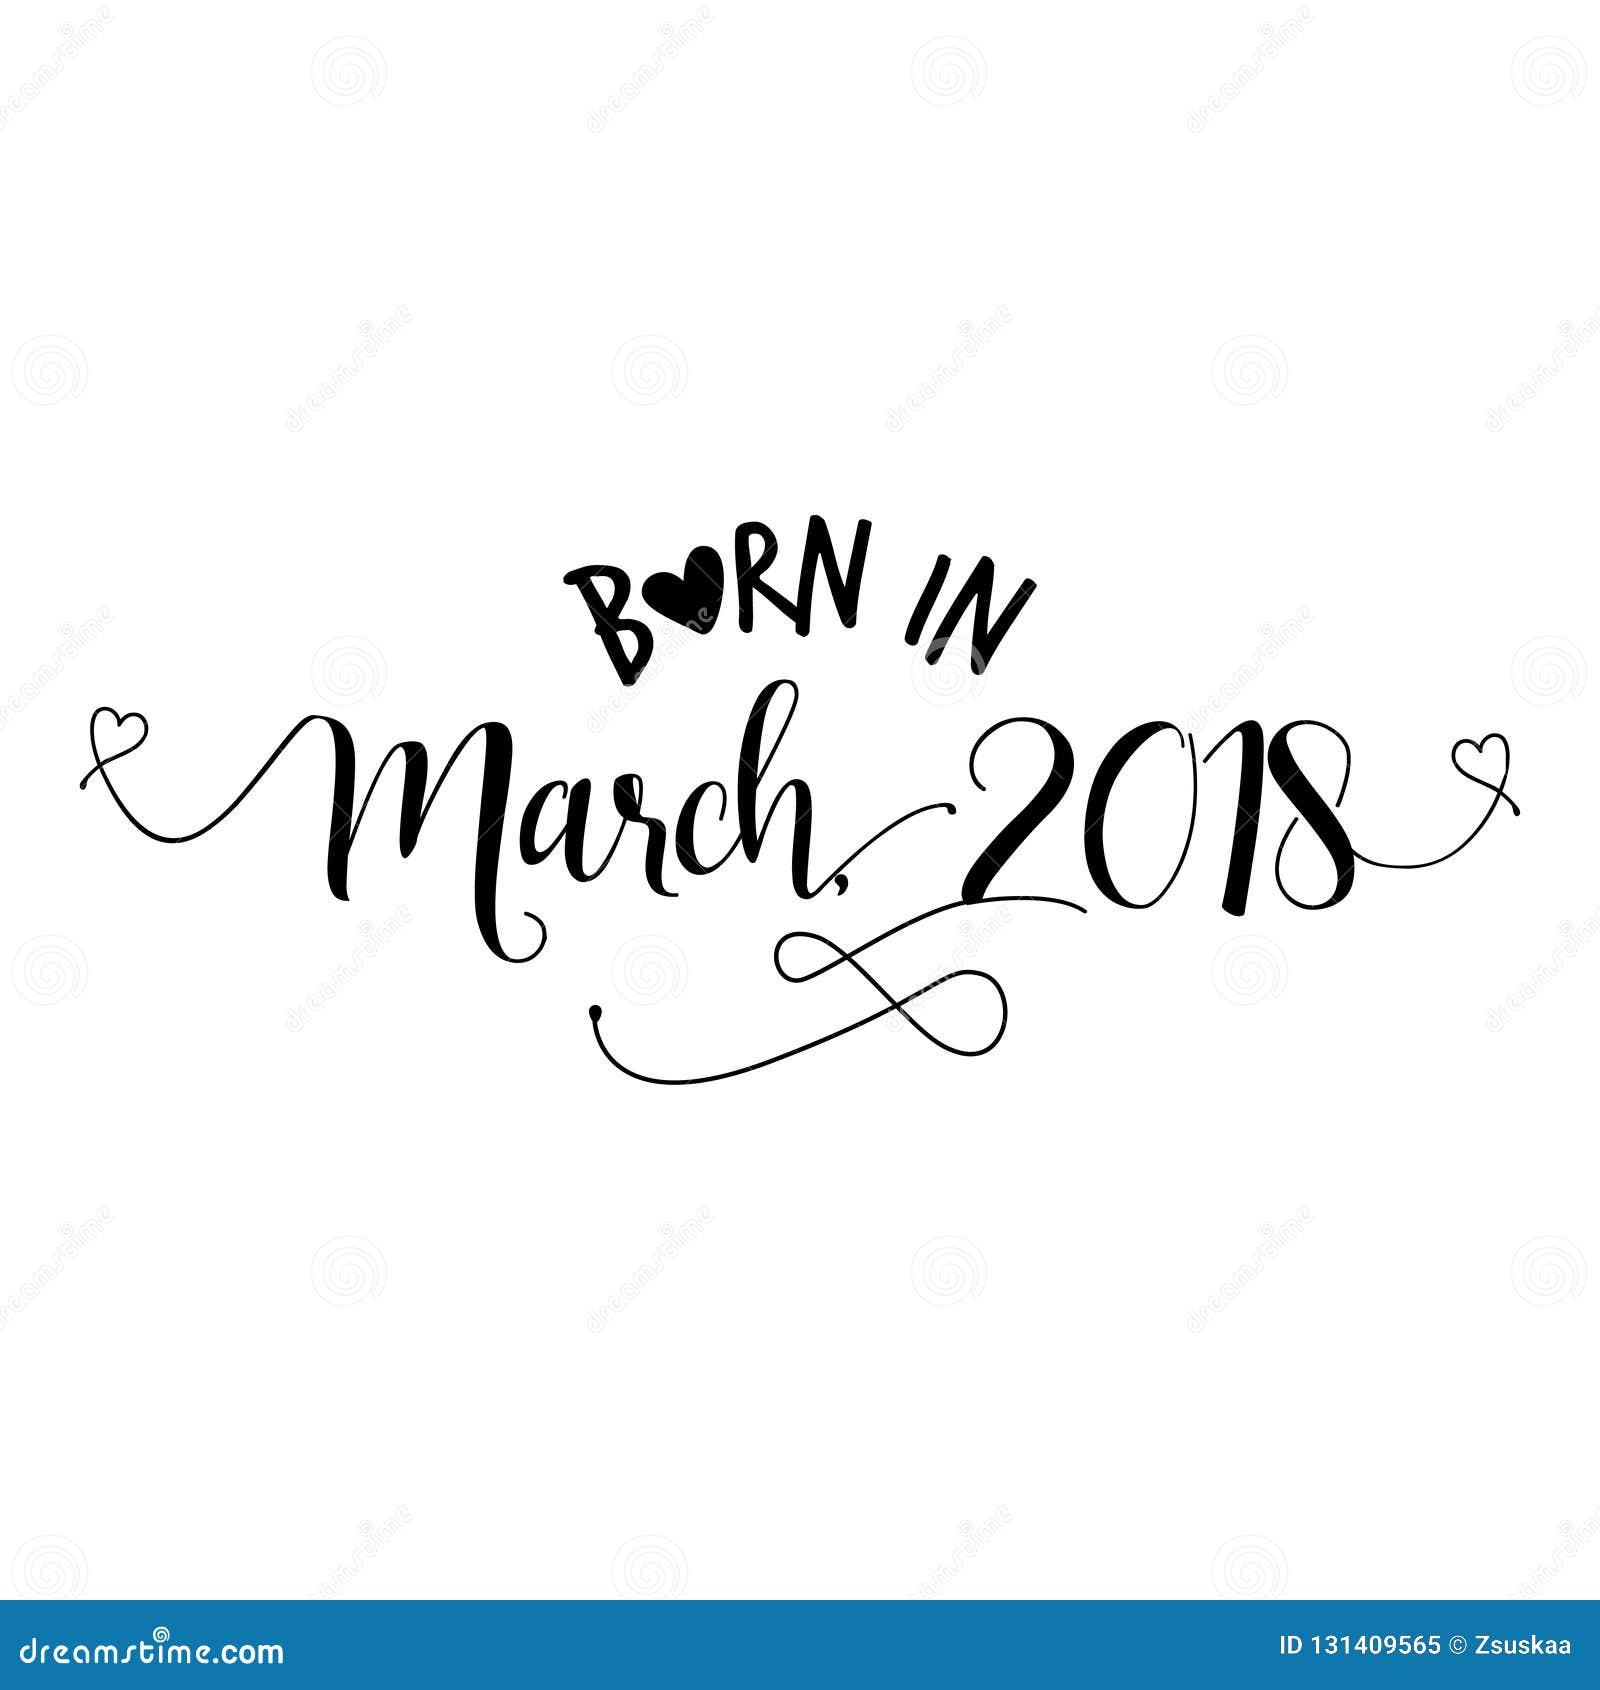 Born in March 2018 - Nursery vector illustration.